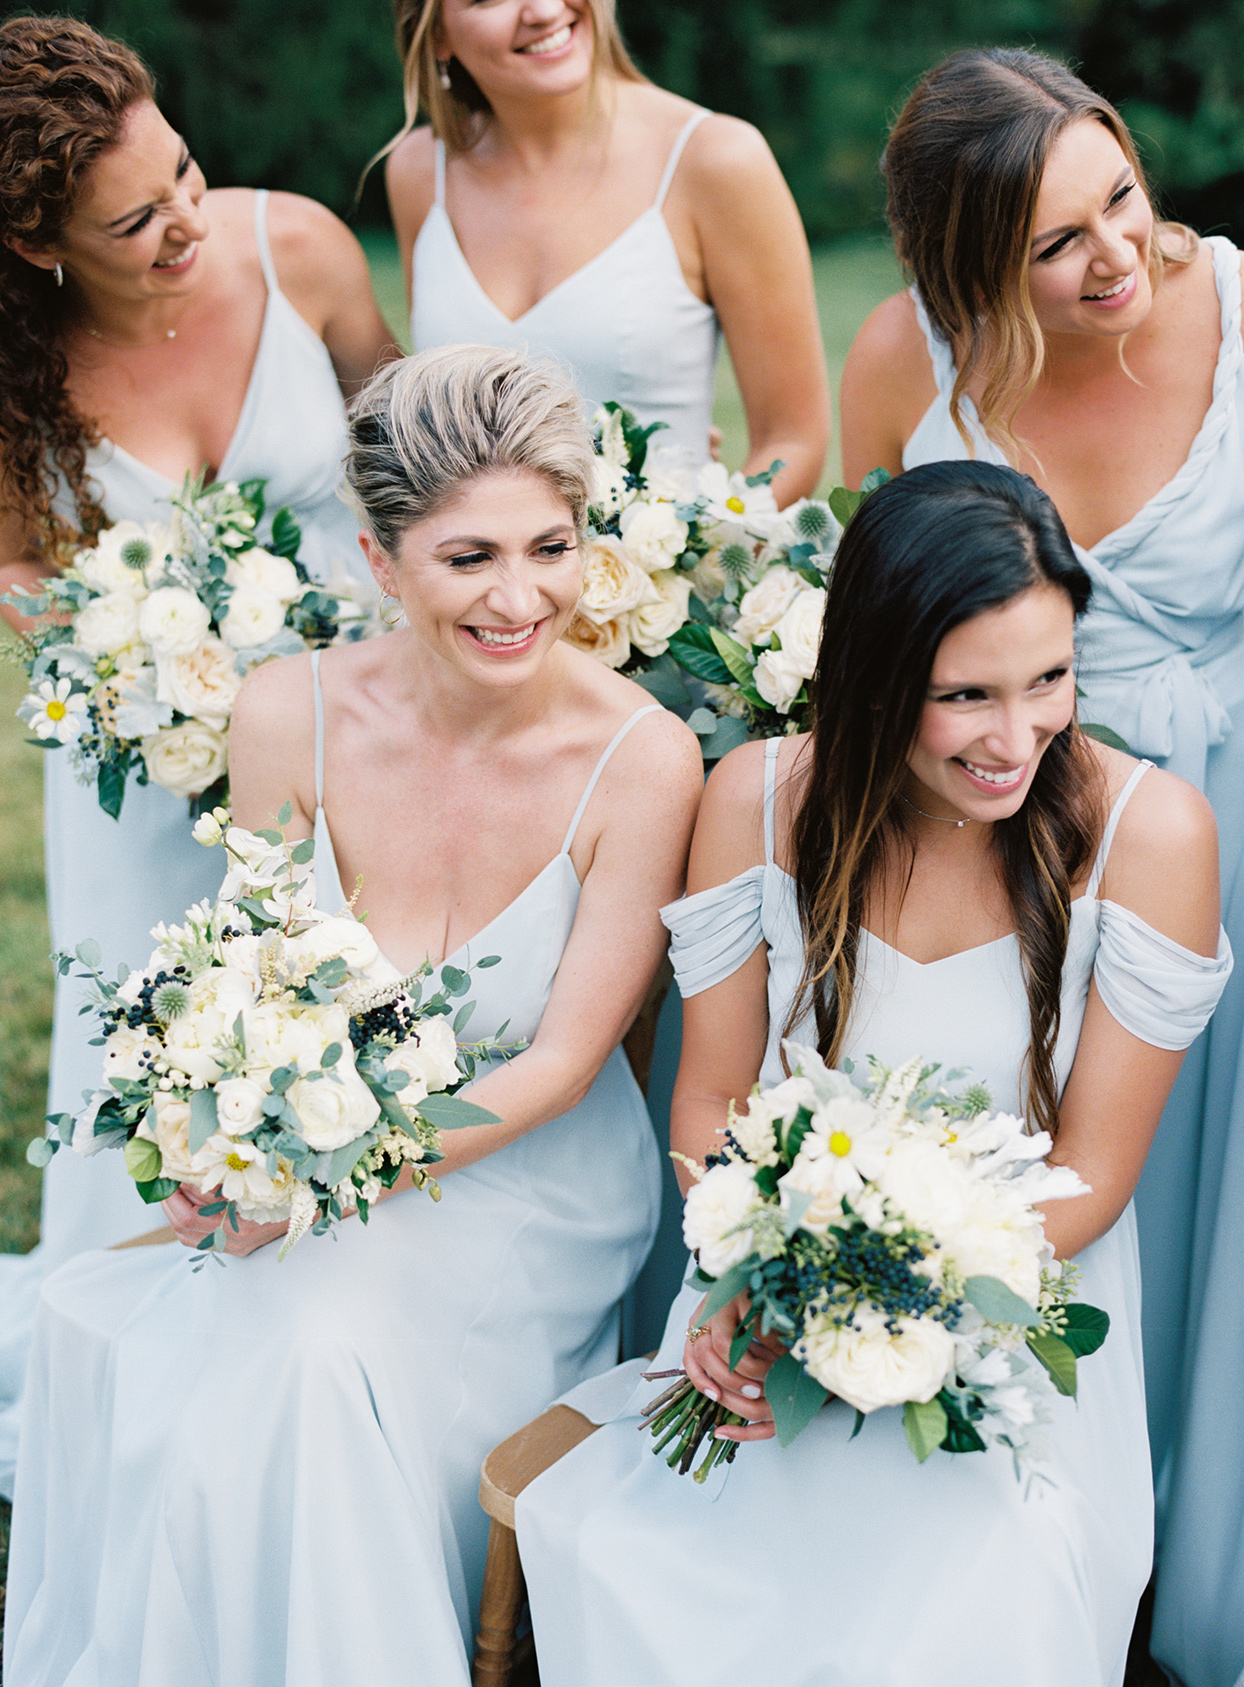 lauren chris wedding bridesmaids sitting in pastel blue dresses